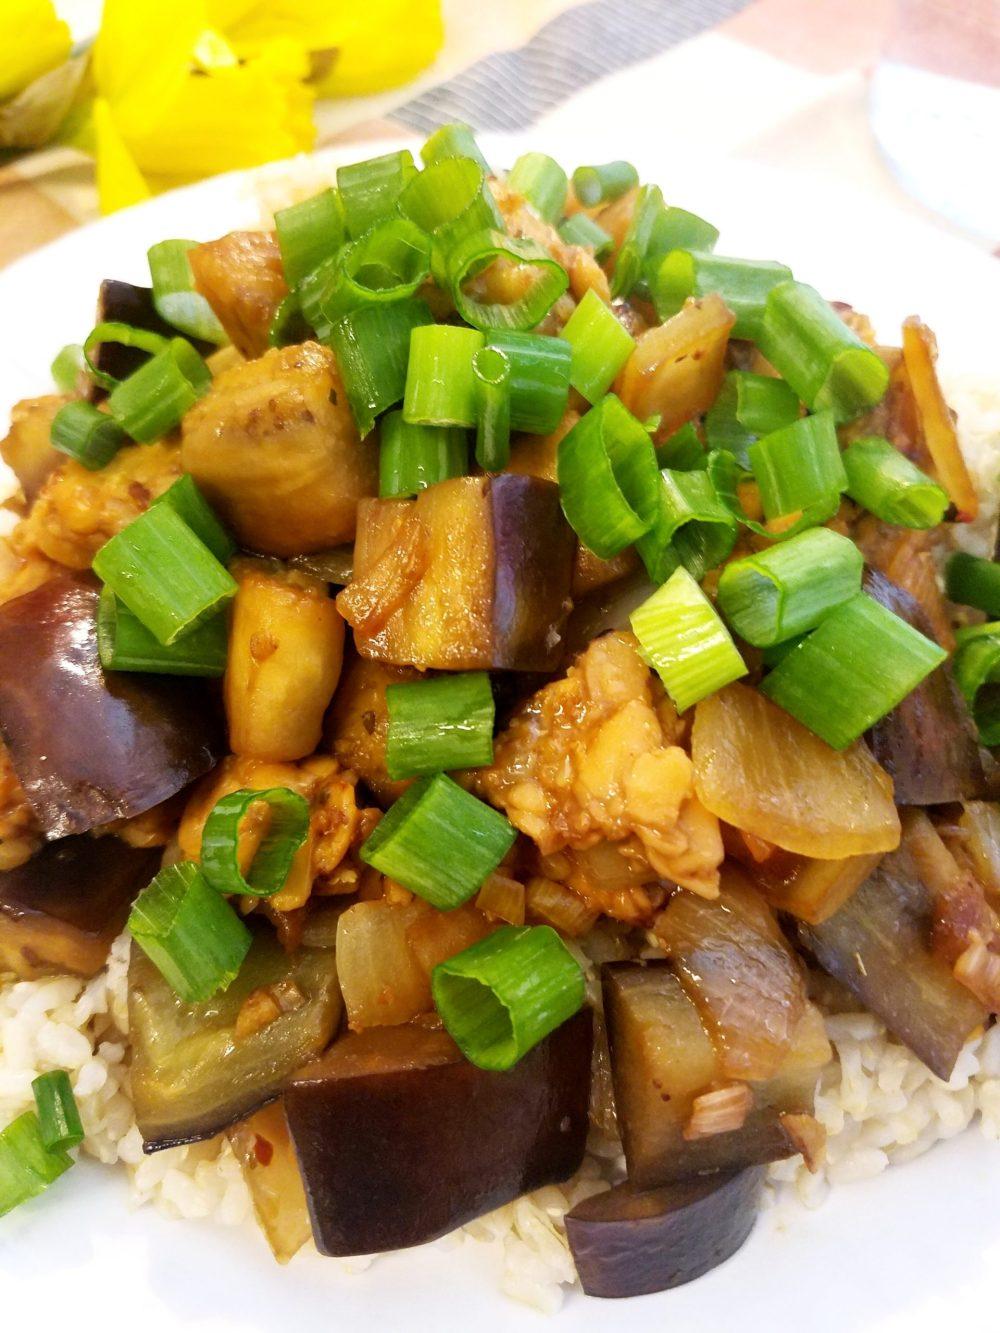 Vegan Filipino Eggplant and Tempeh